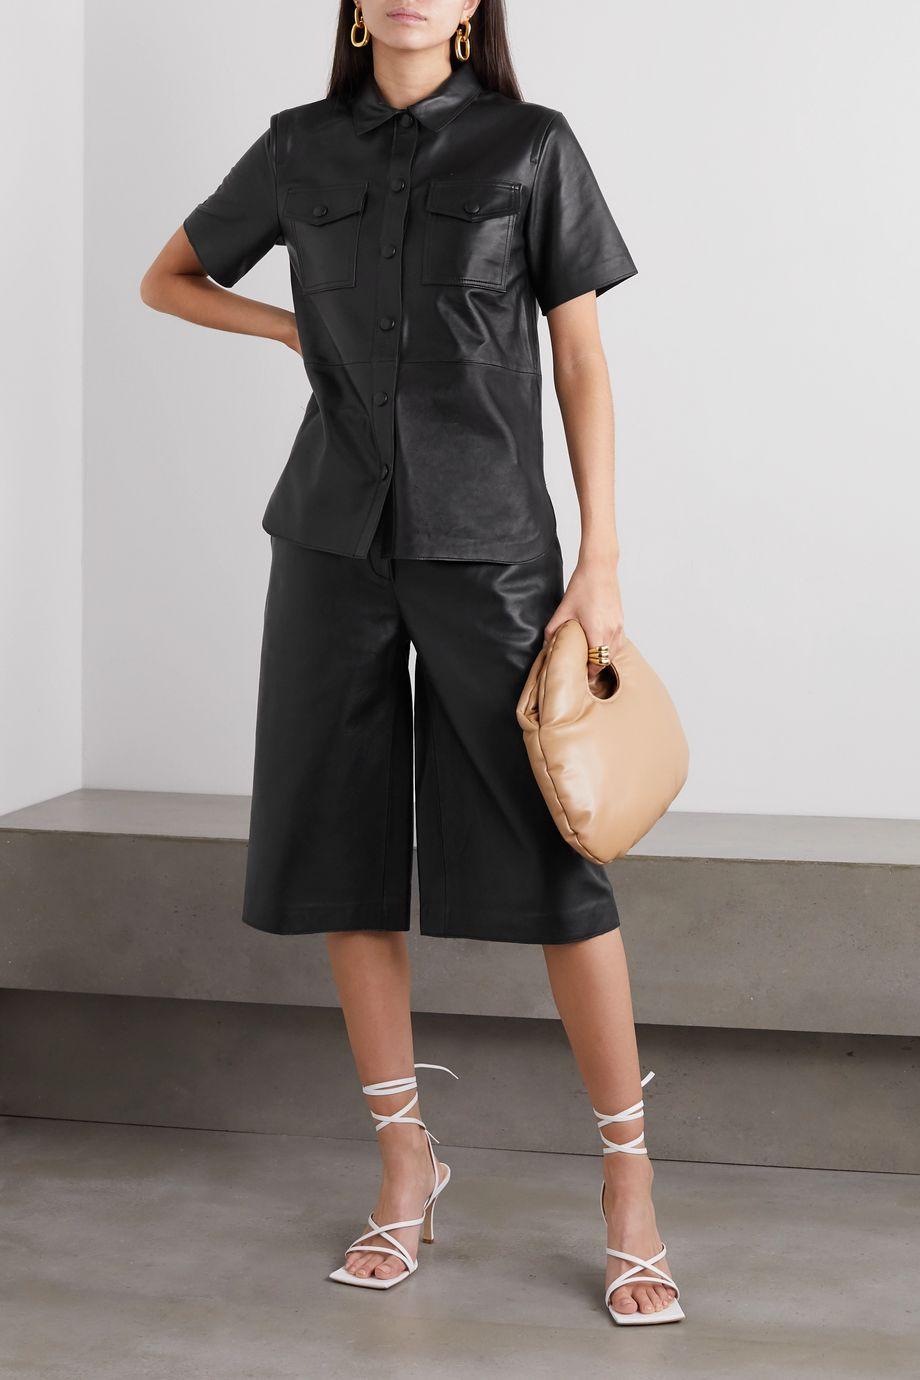 Stand Studio Megan leather shorts